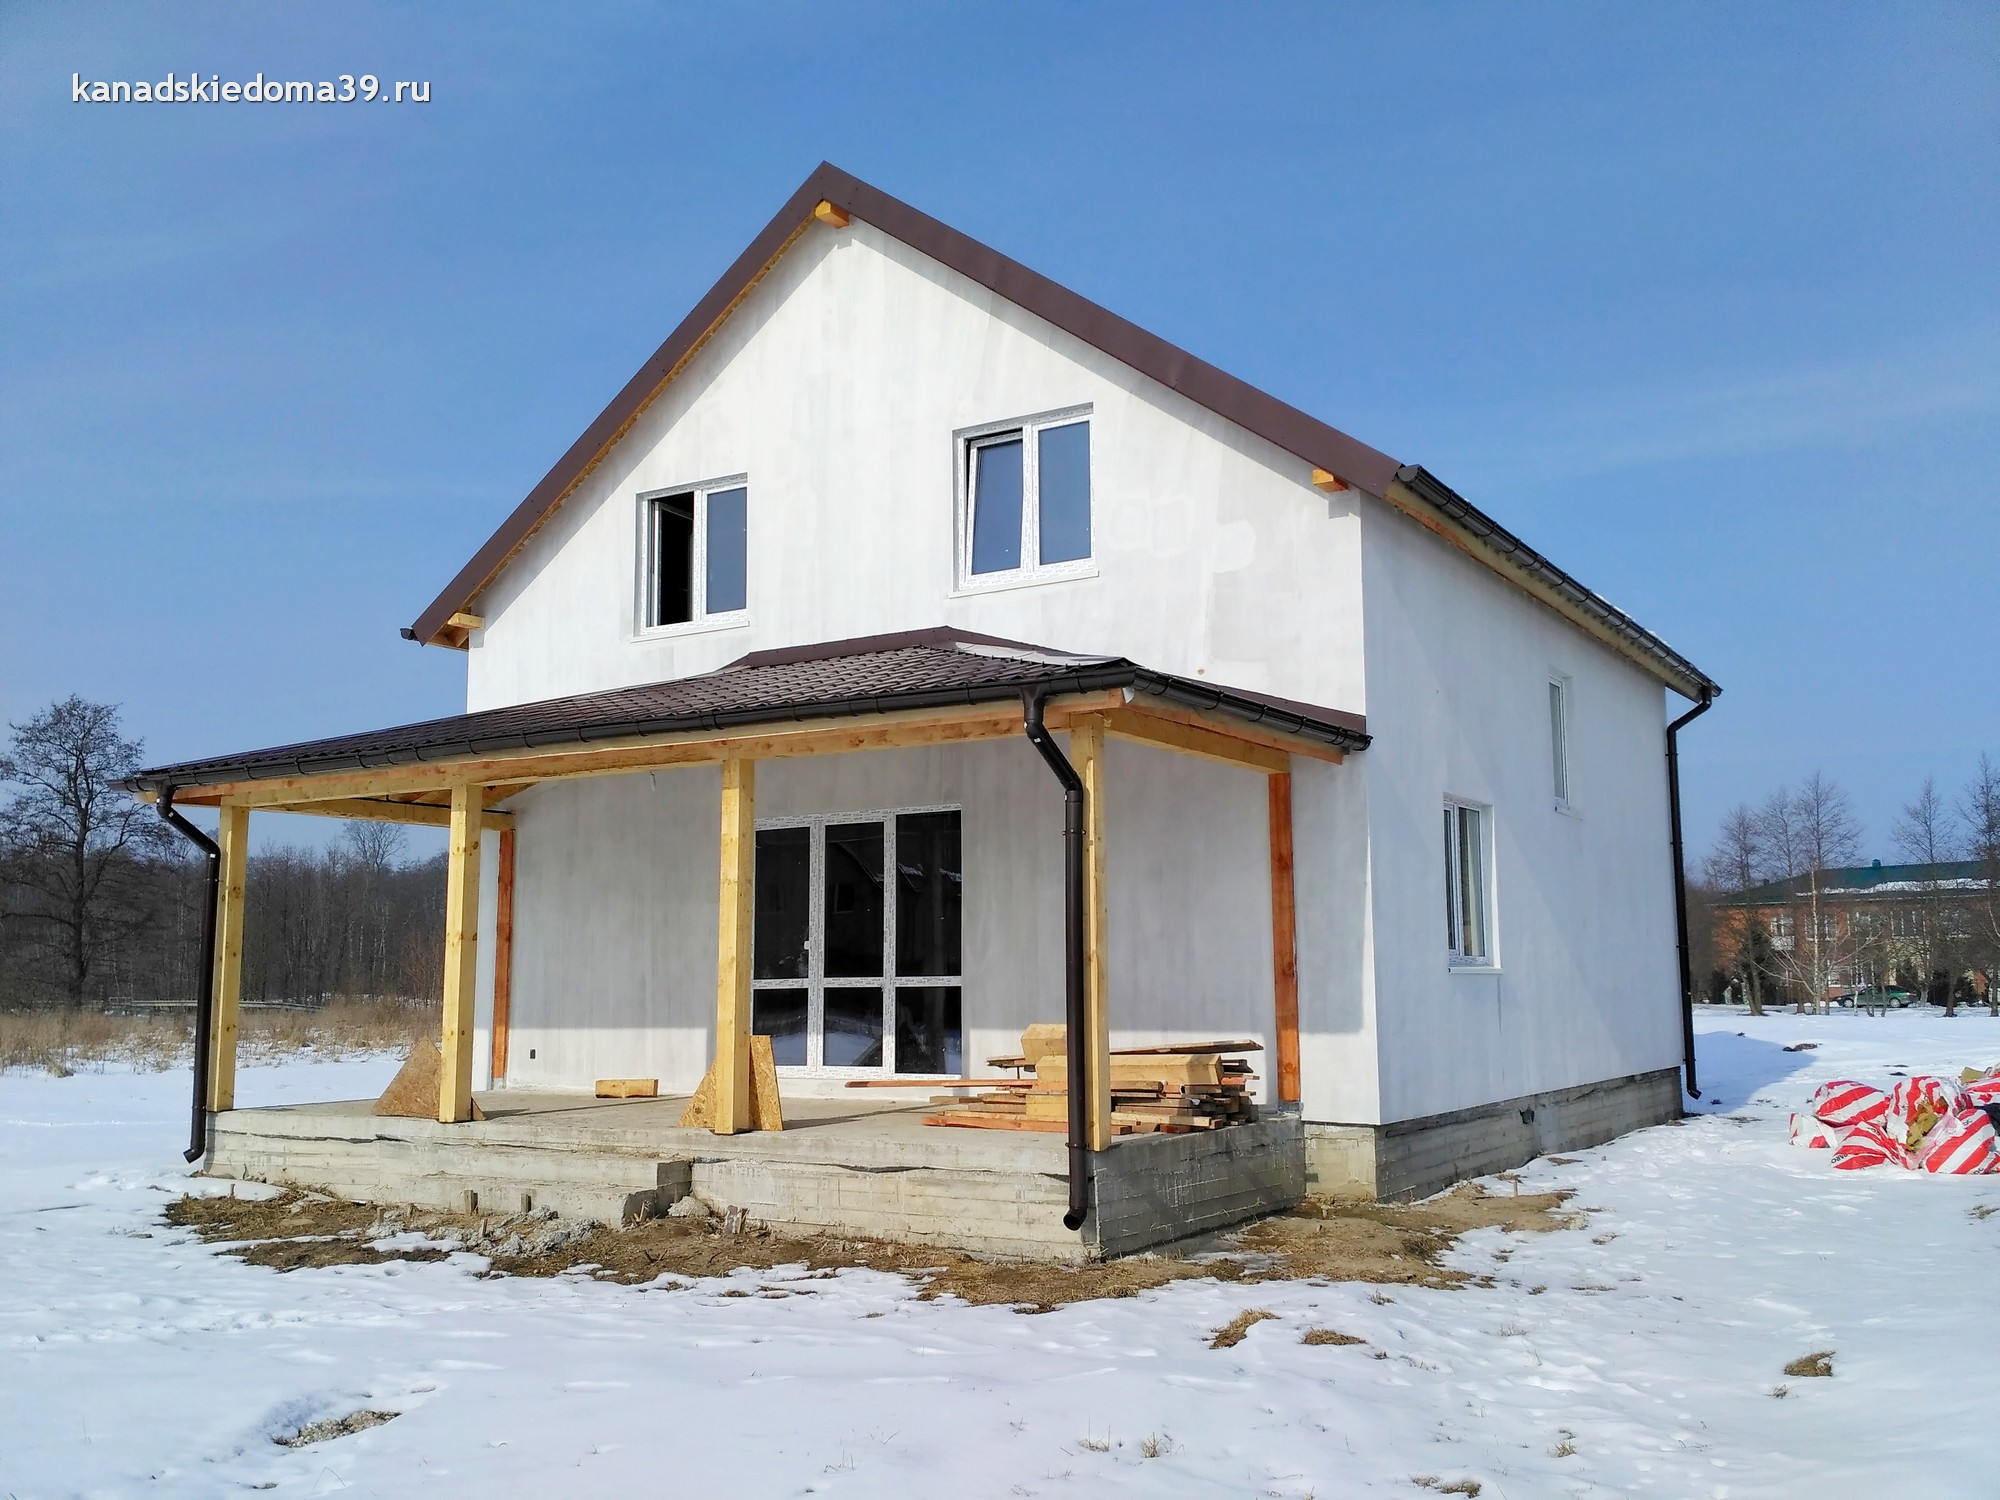 kanadskie-doma-sip-kovrovo012